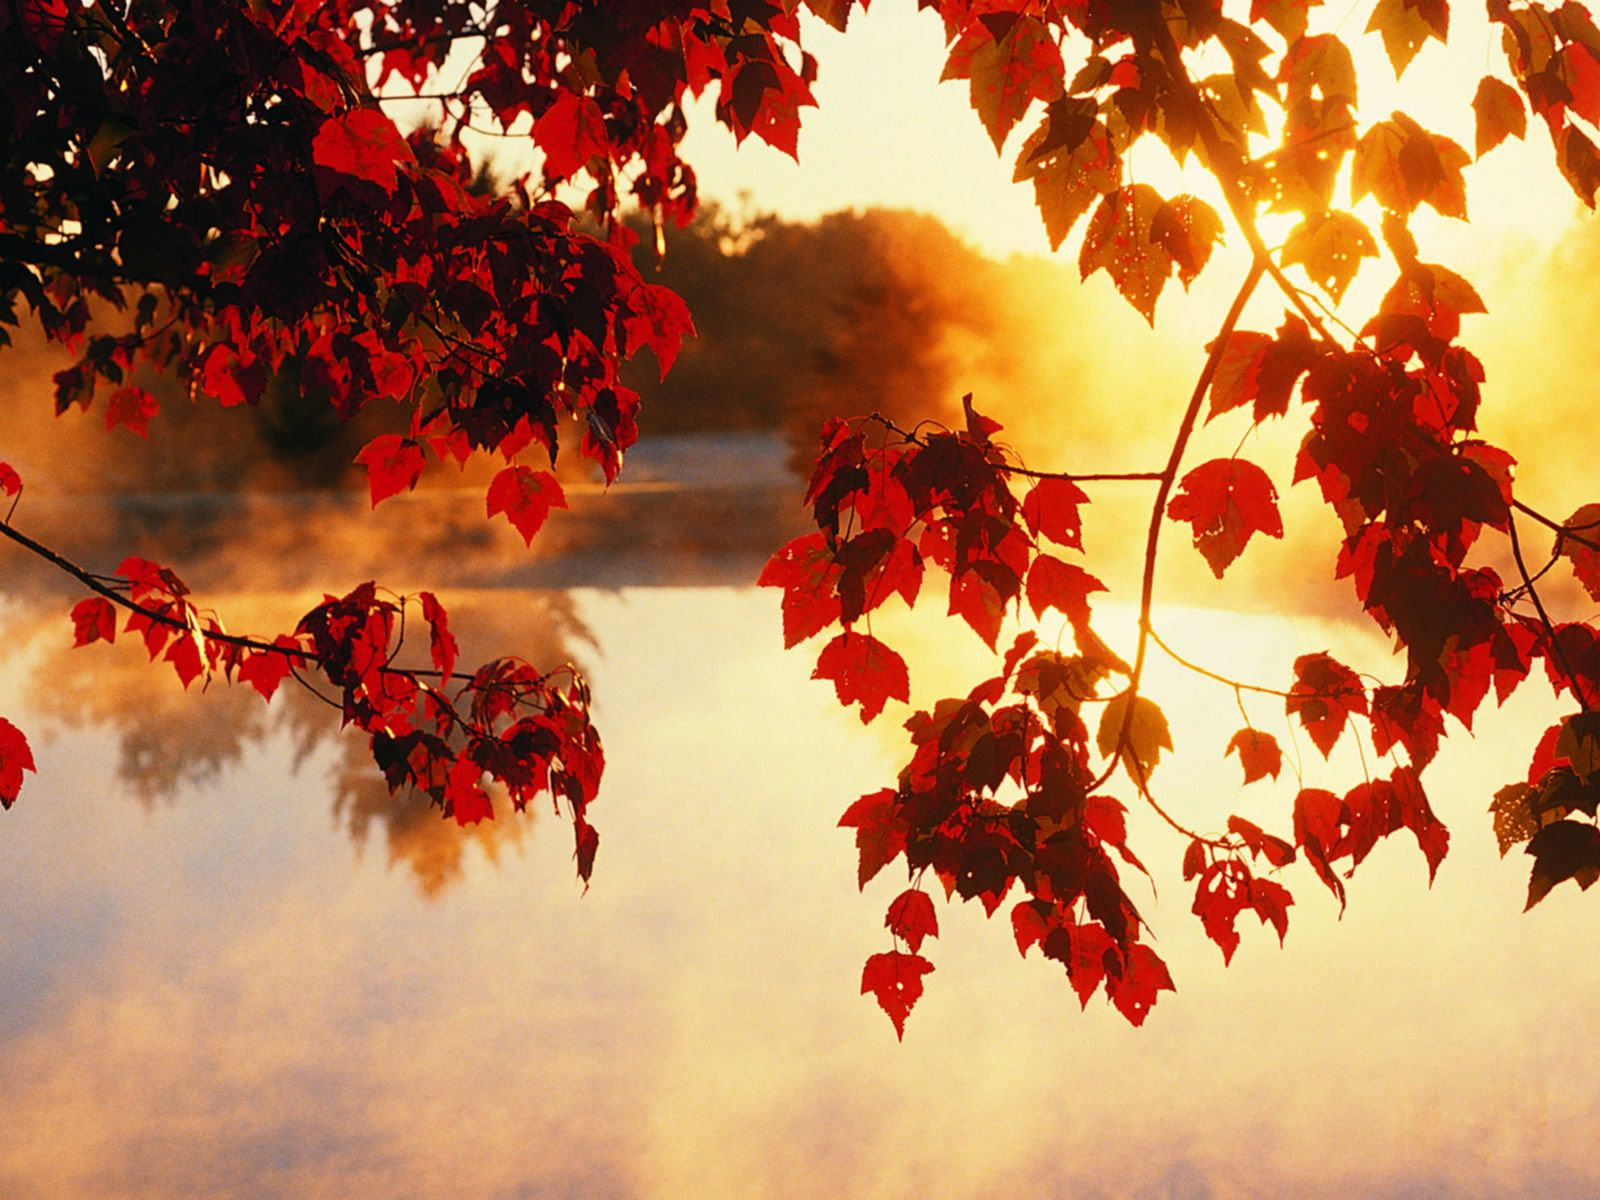 Red Autumn Sunshine Wallpaper HD Forever Autumn Pinterest